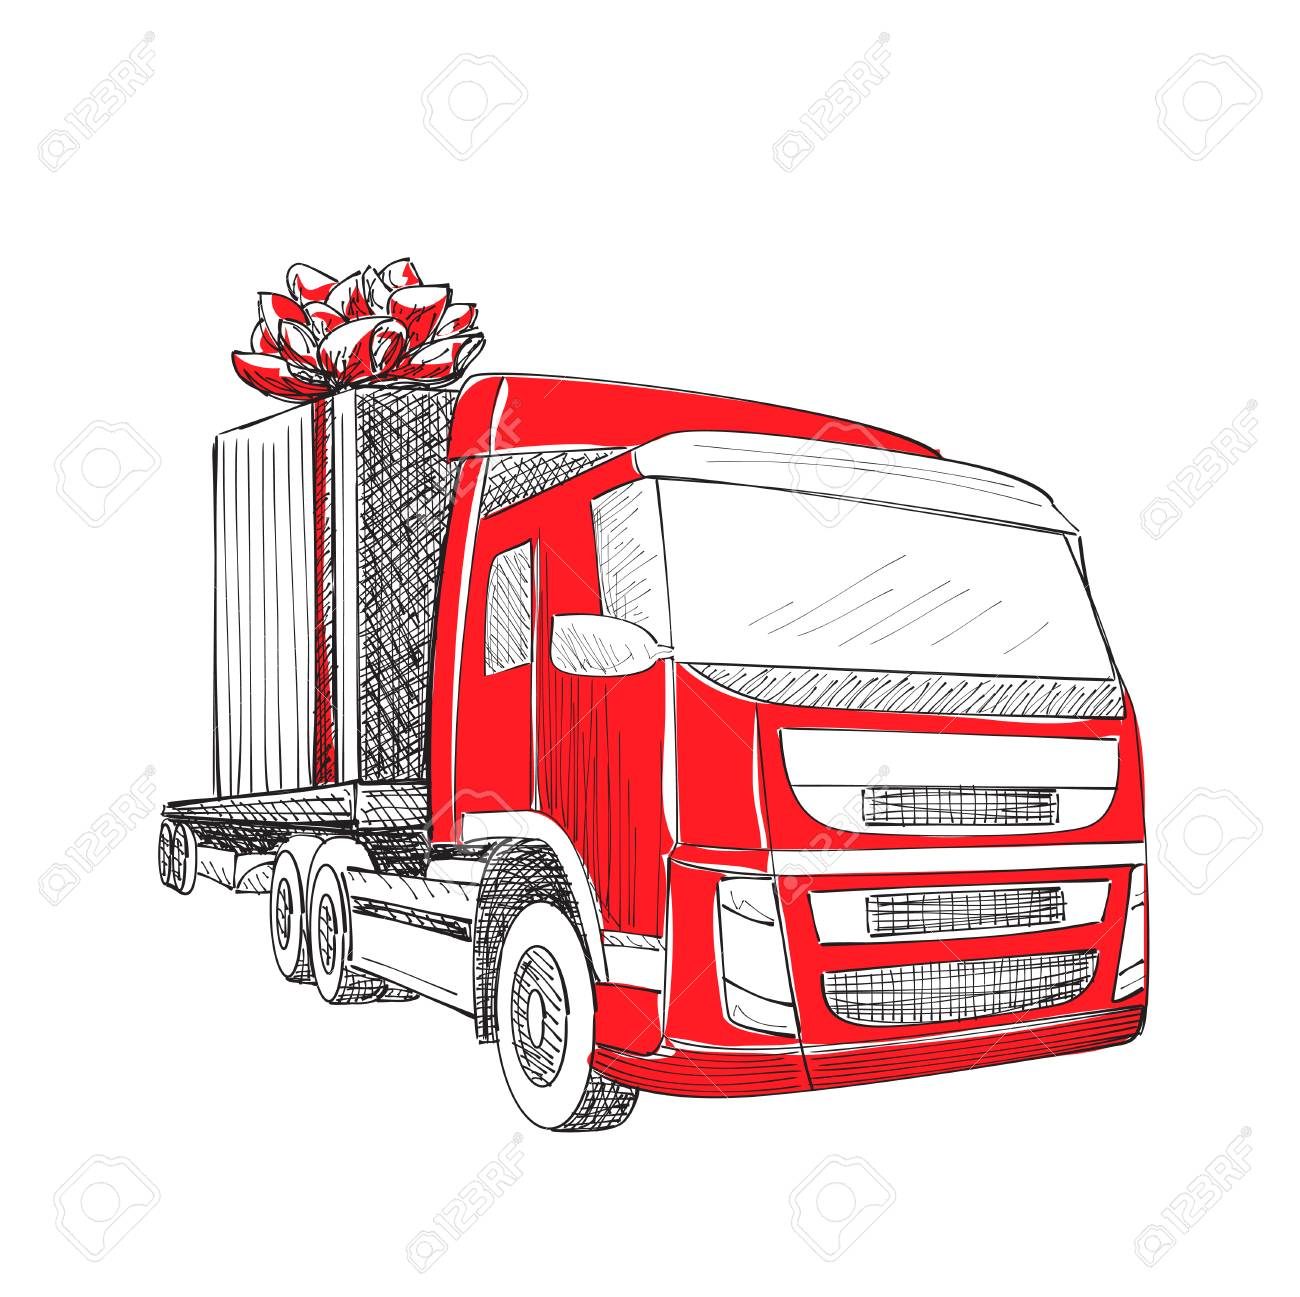 Truck van christmas gift box bow ribbon delivery service van truck van christmas gift box bow ribbon delivery service van new year greeting card m4hsunfo Gallery